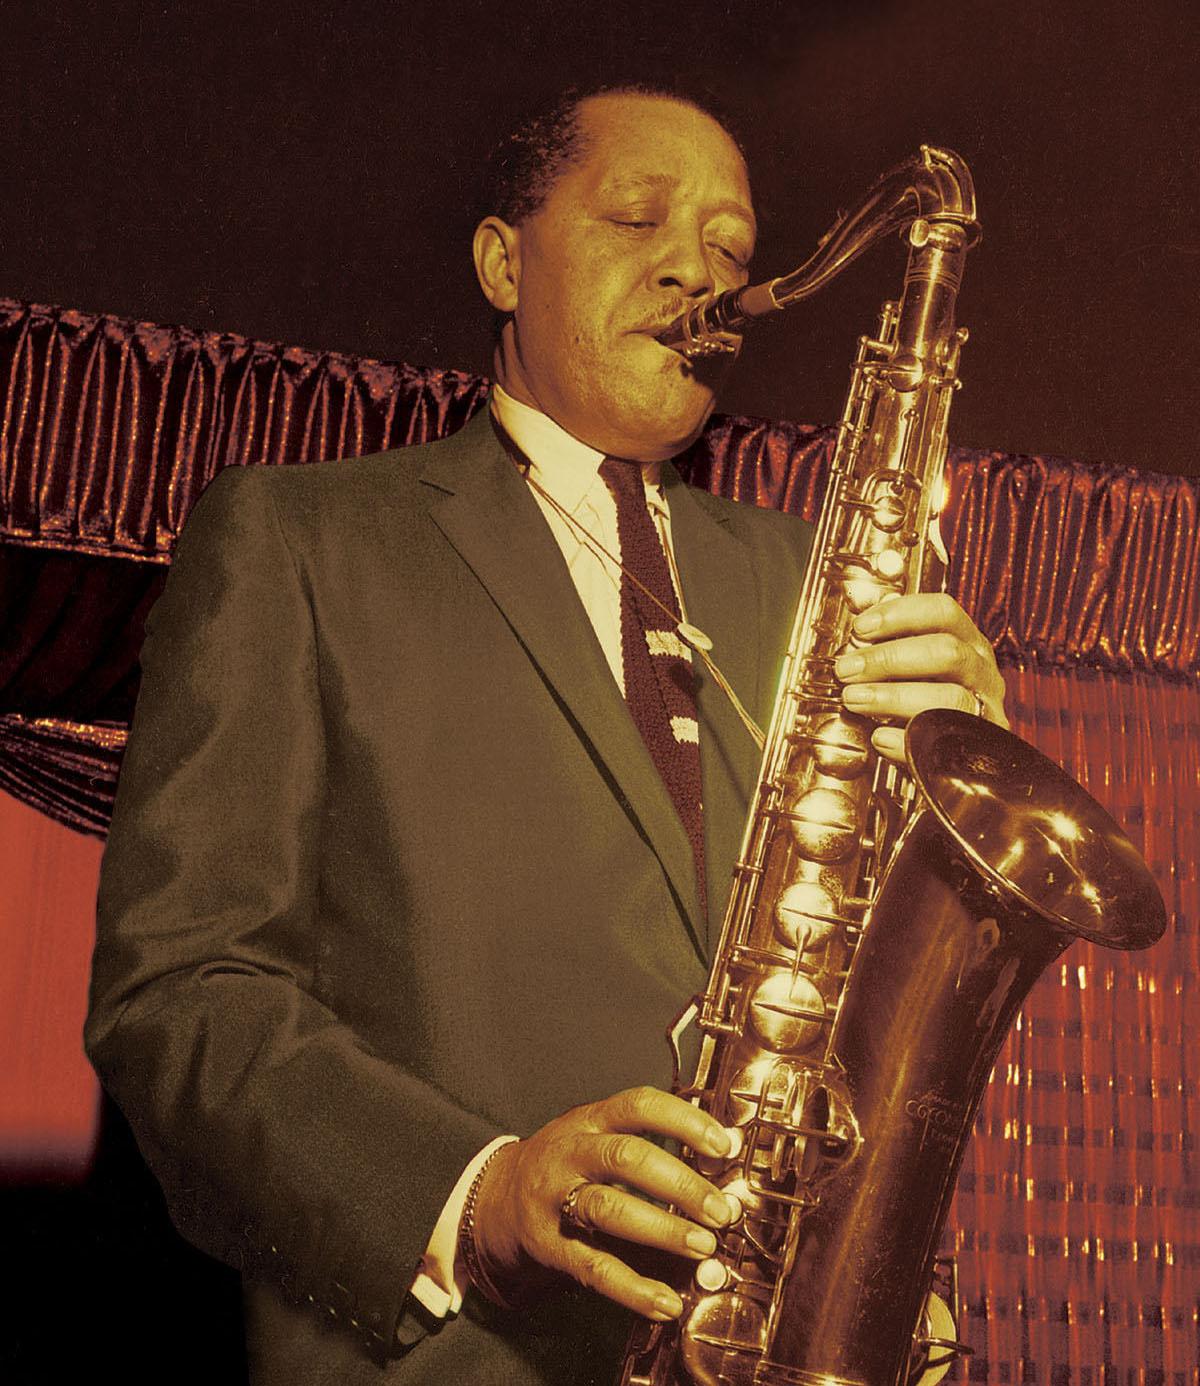 История о том, как Лестер Янг изобрел кул-джаз | JazzPeople